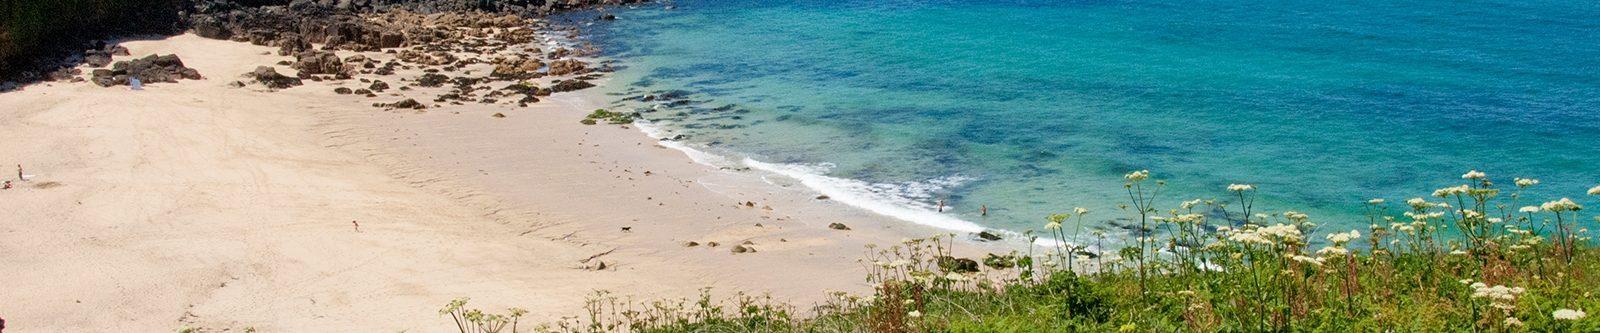 Portheras beach